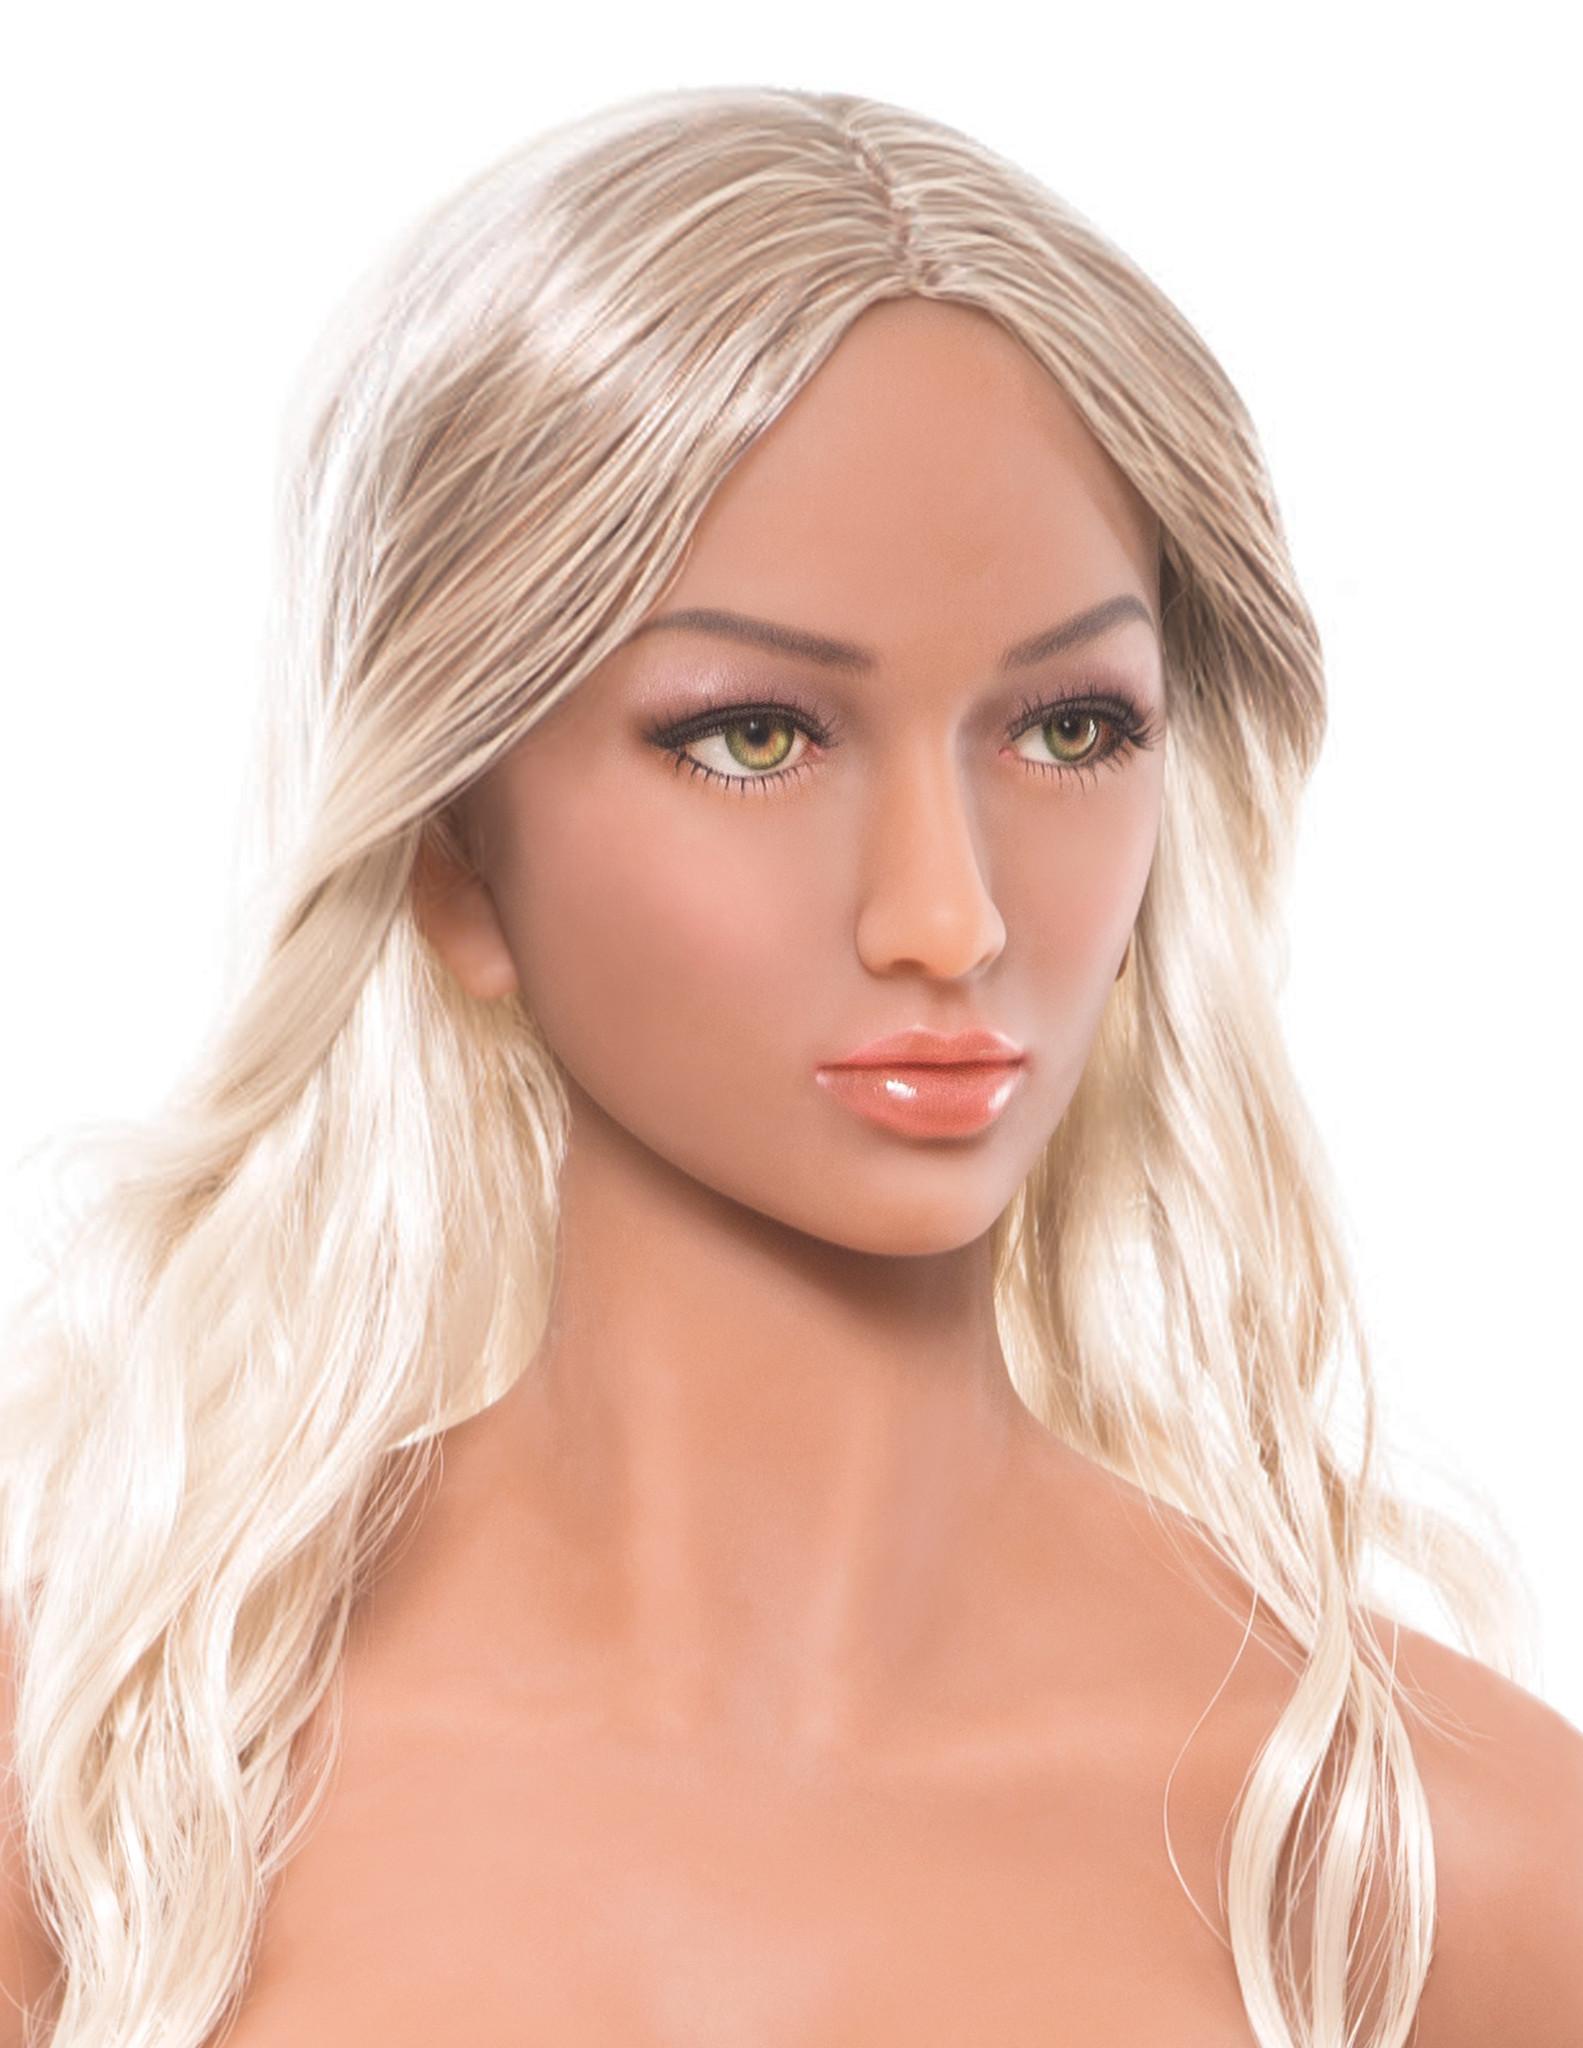 Ultimate Fantasy Dolls